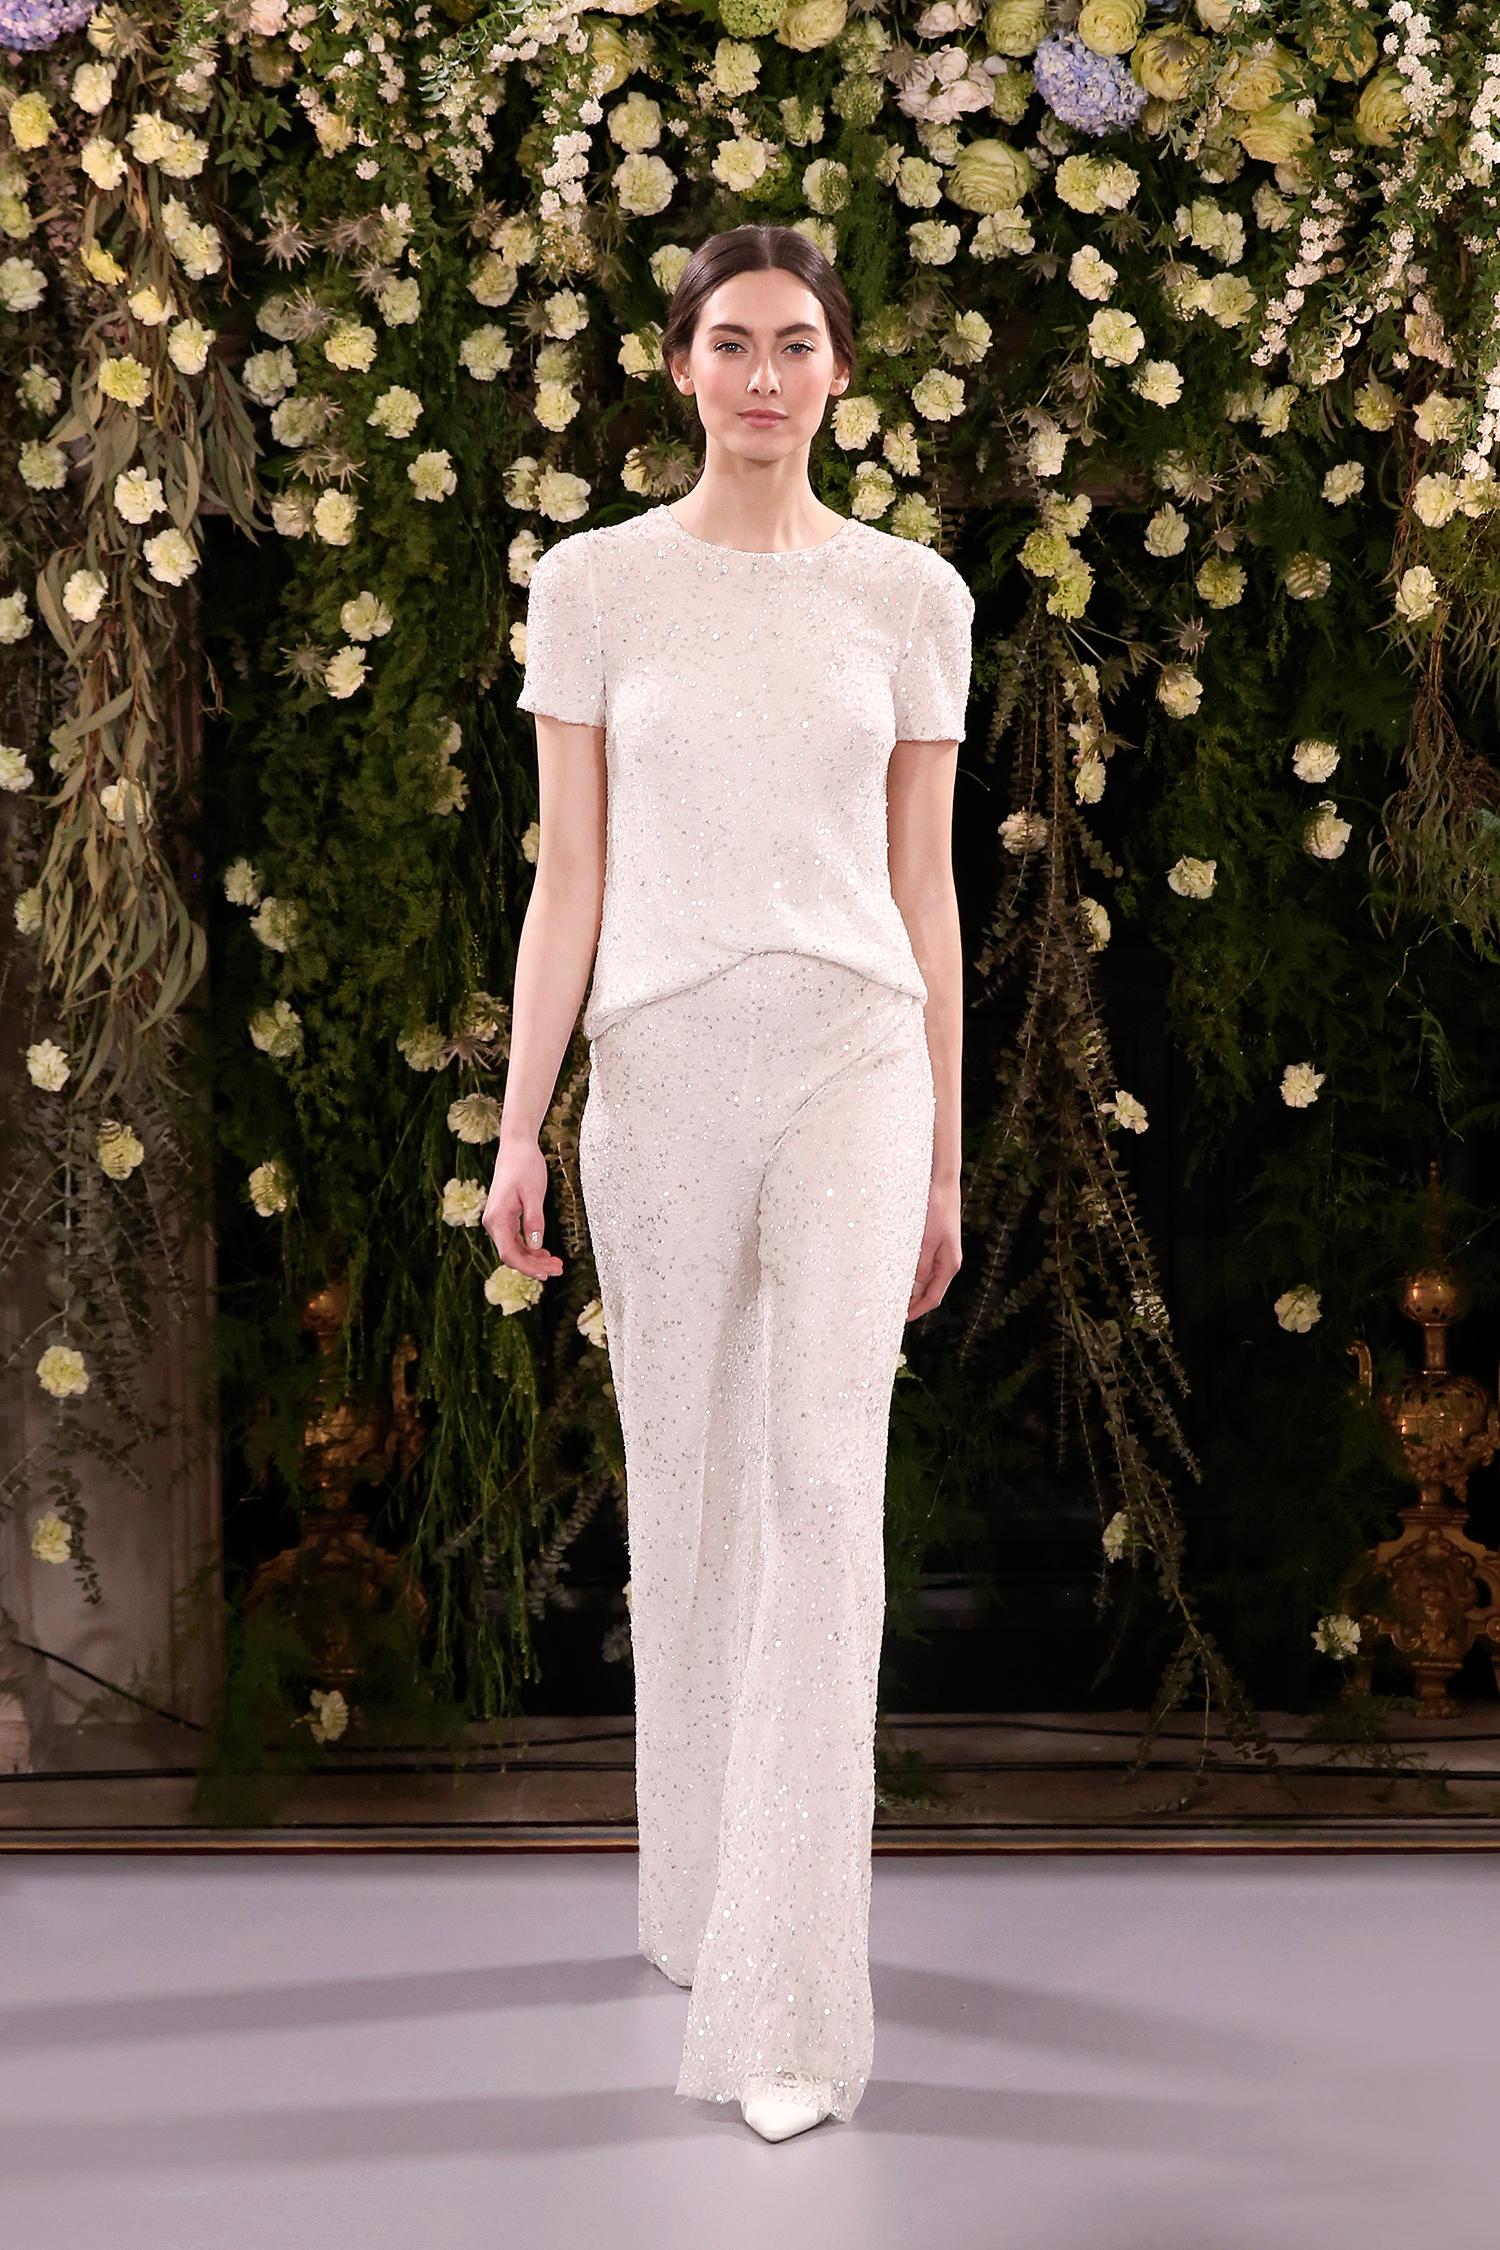 jenny packham wedding dress spring 2019 pants separates with sparkles